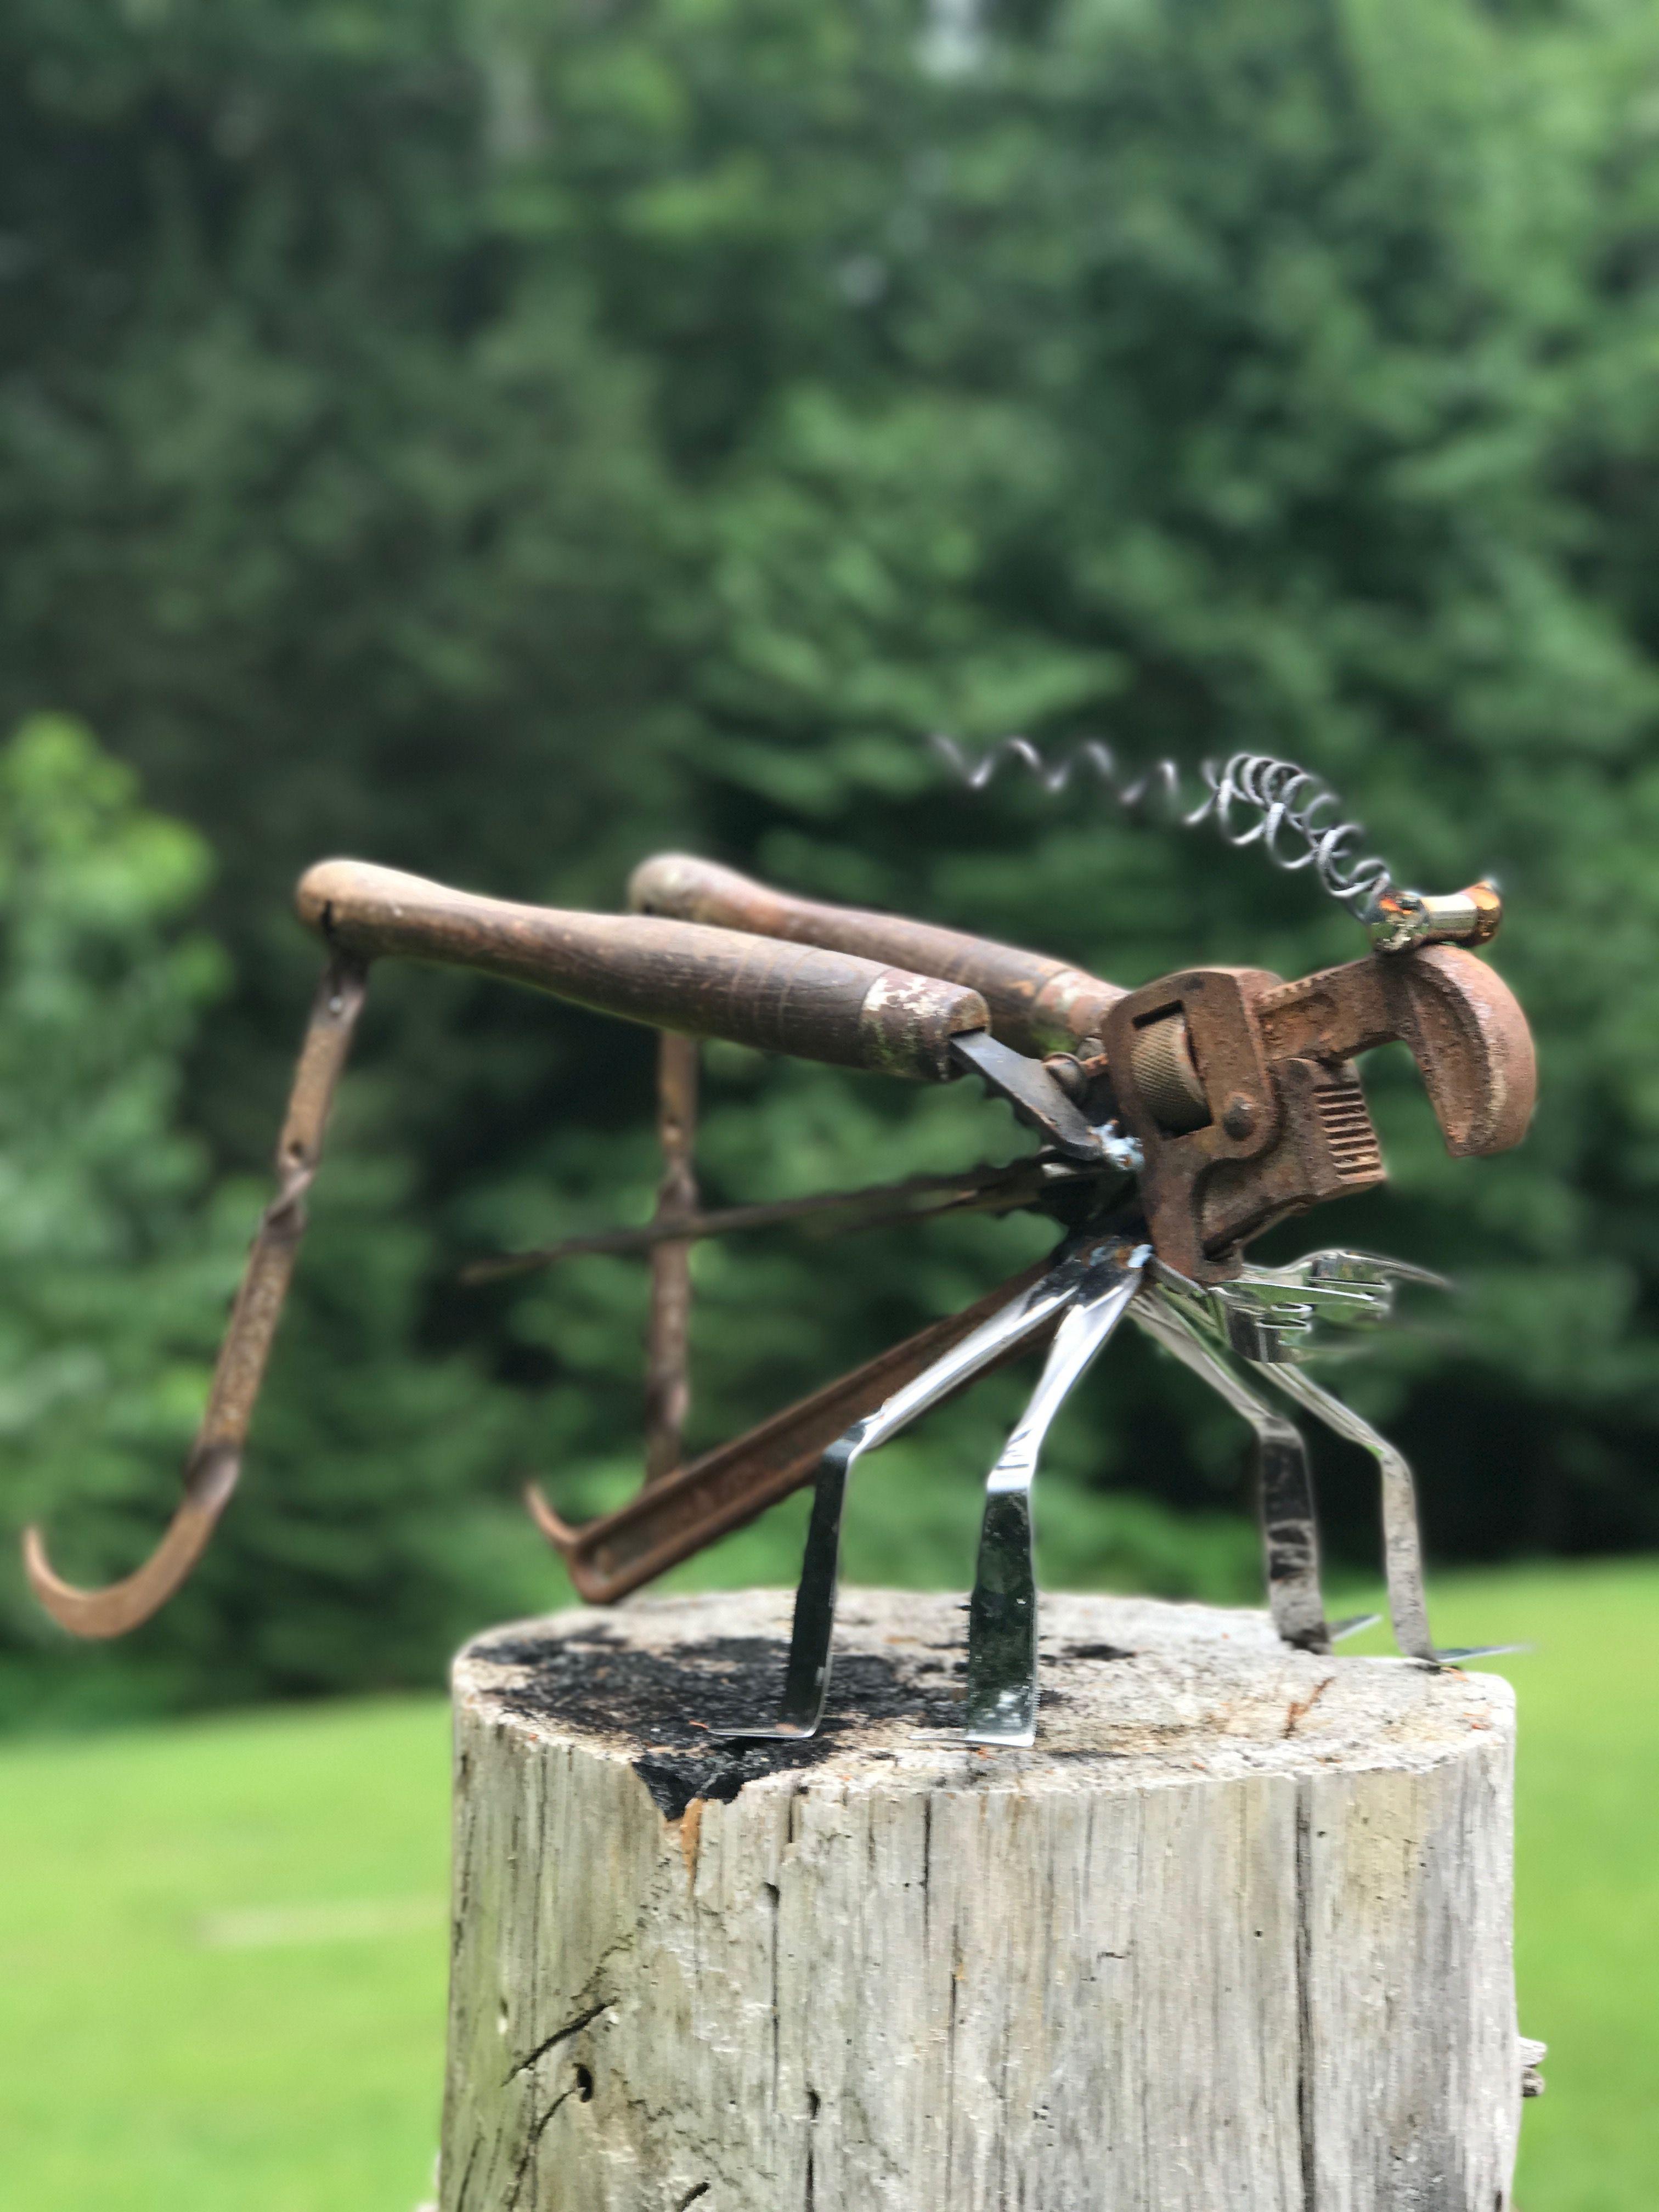 Pin By Michelle Mendez On Honey Please Make Metal Art Metal Art Sculpture Scrap Metal Art